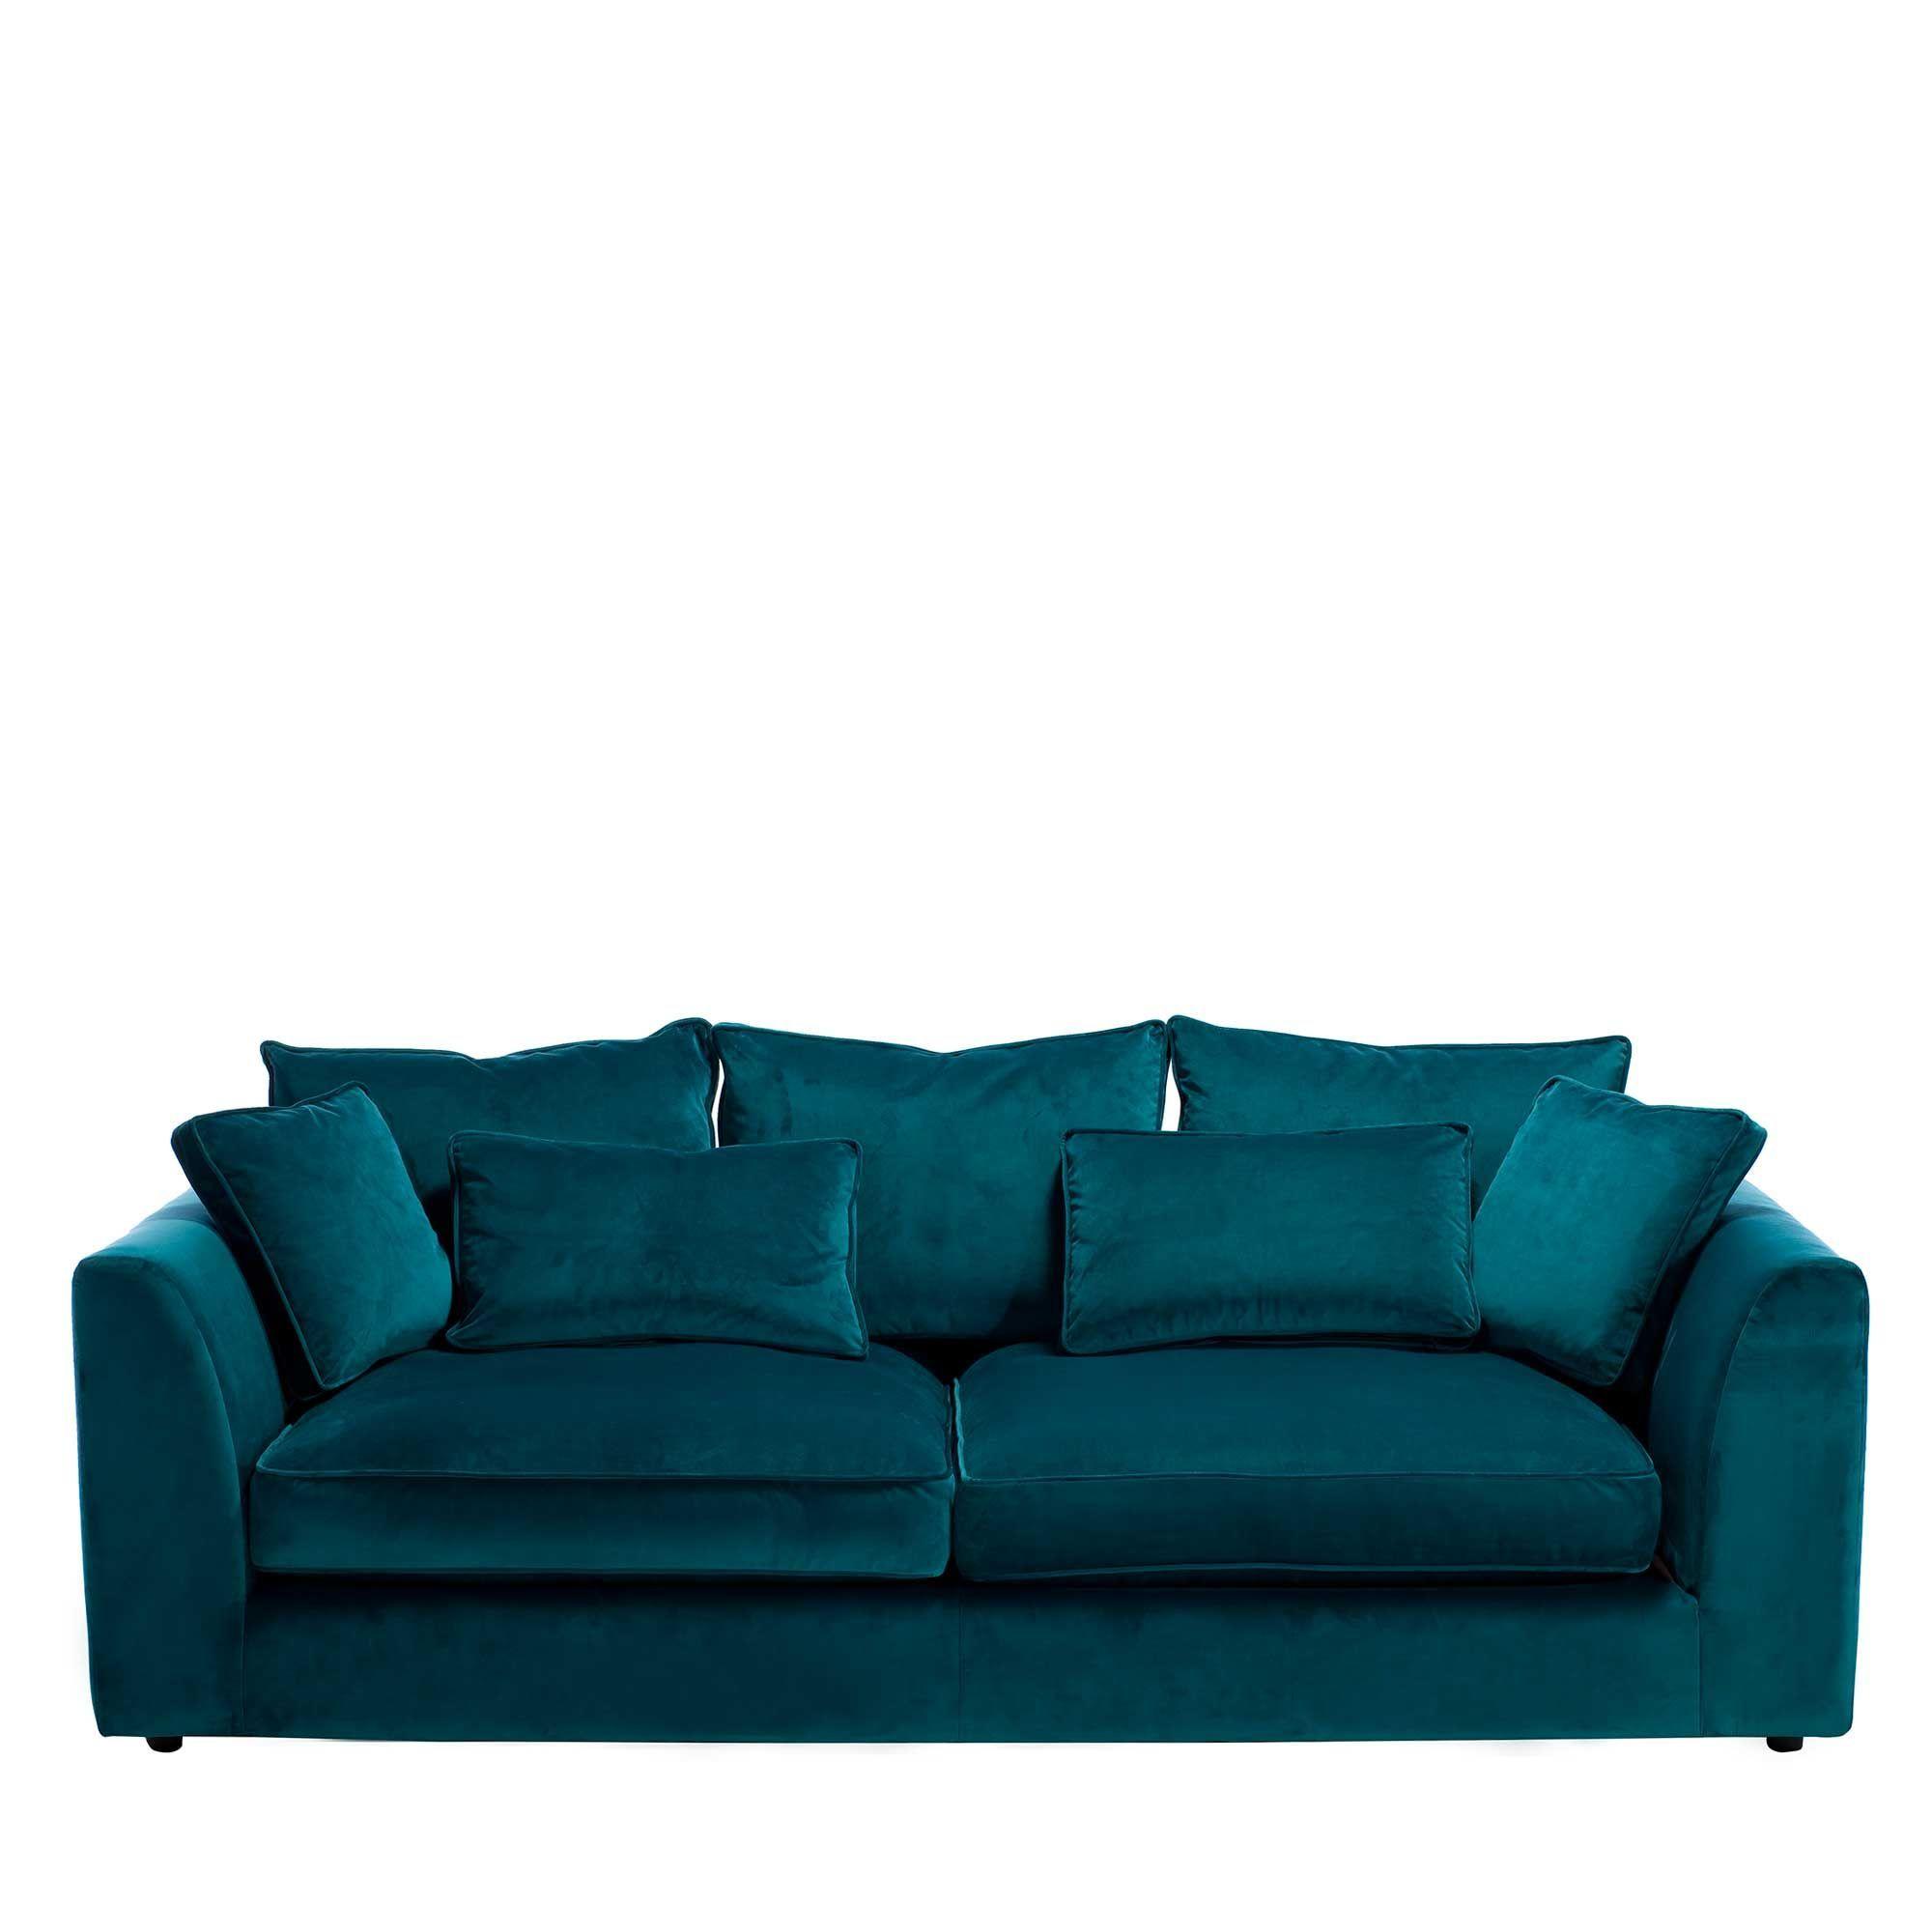 Pin By Sofacouchs On Sectional Sofa Large Sofa Teal Velvet Sofa Corner Sofa Living Room